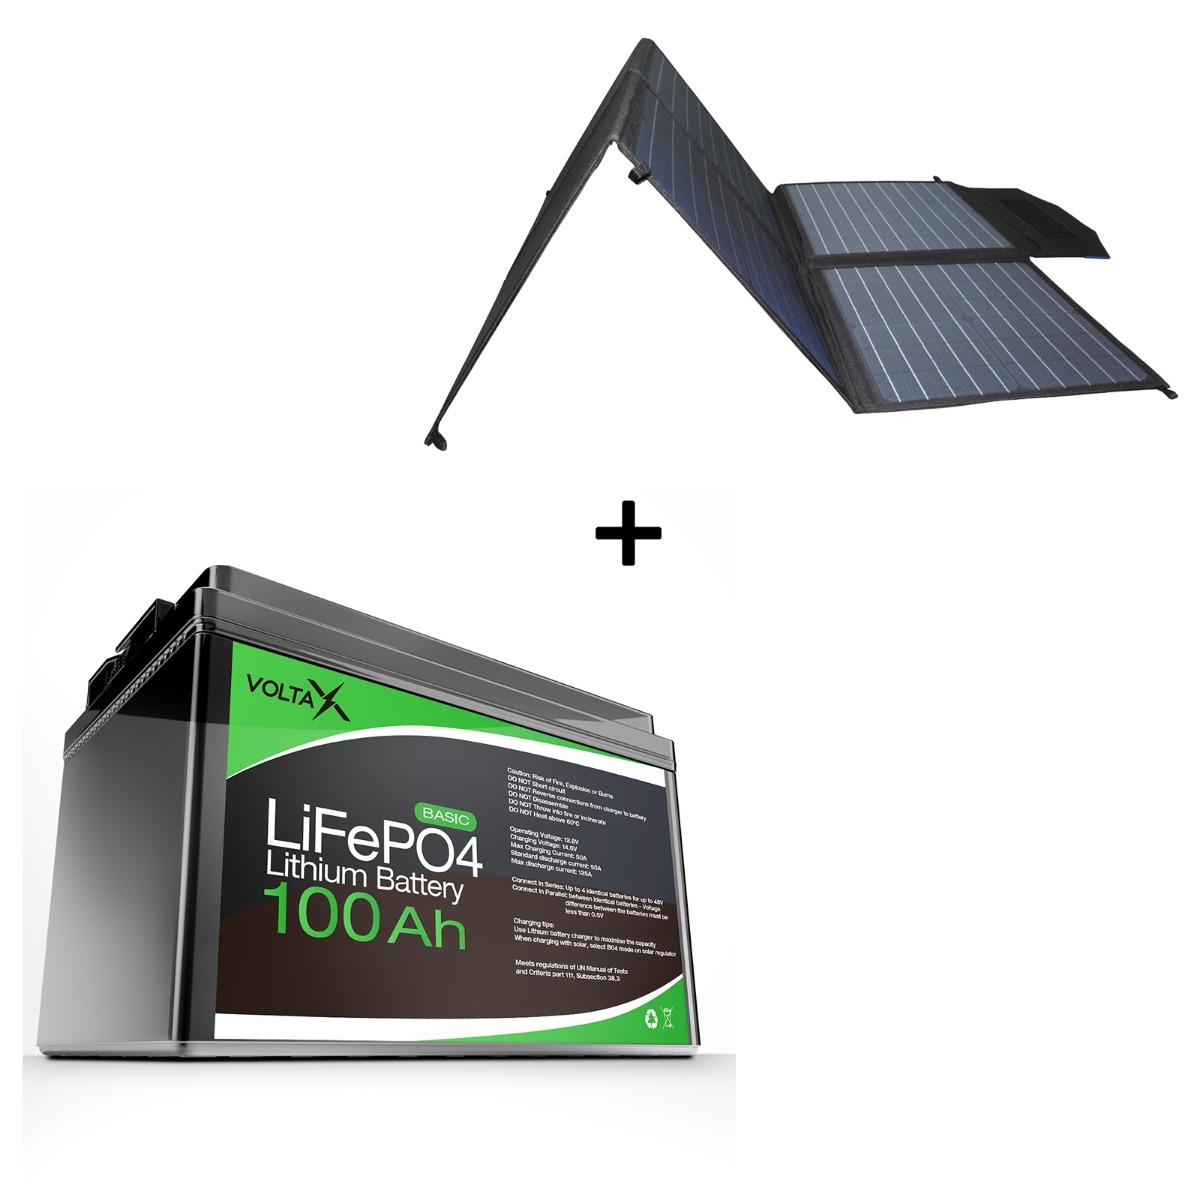 BUNDLE DEAL - VoltaX 12V 100Ah LifePO4 Lithium Battery + Maxray 12V 200W Folding Solar Blanket